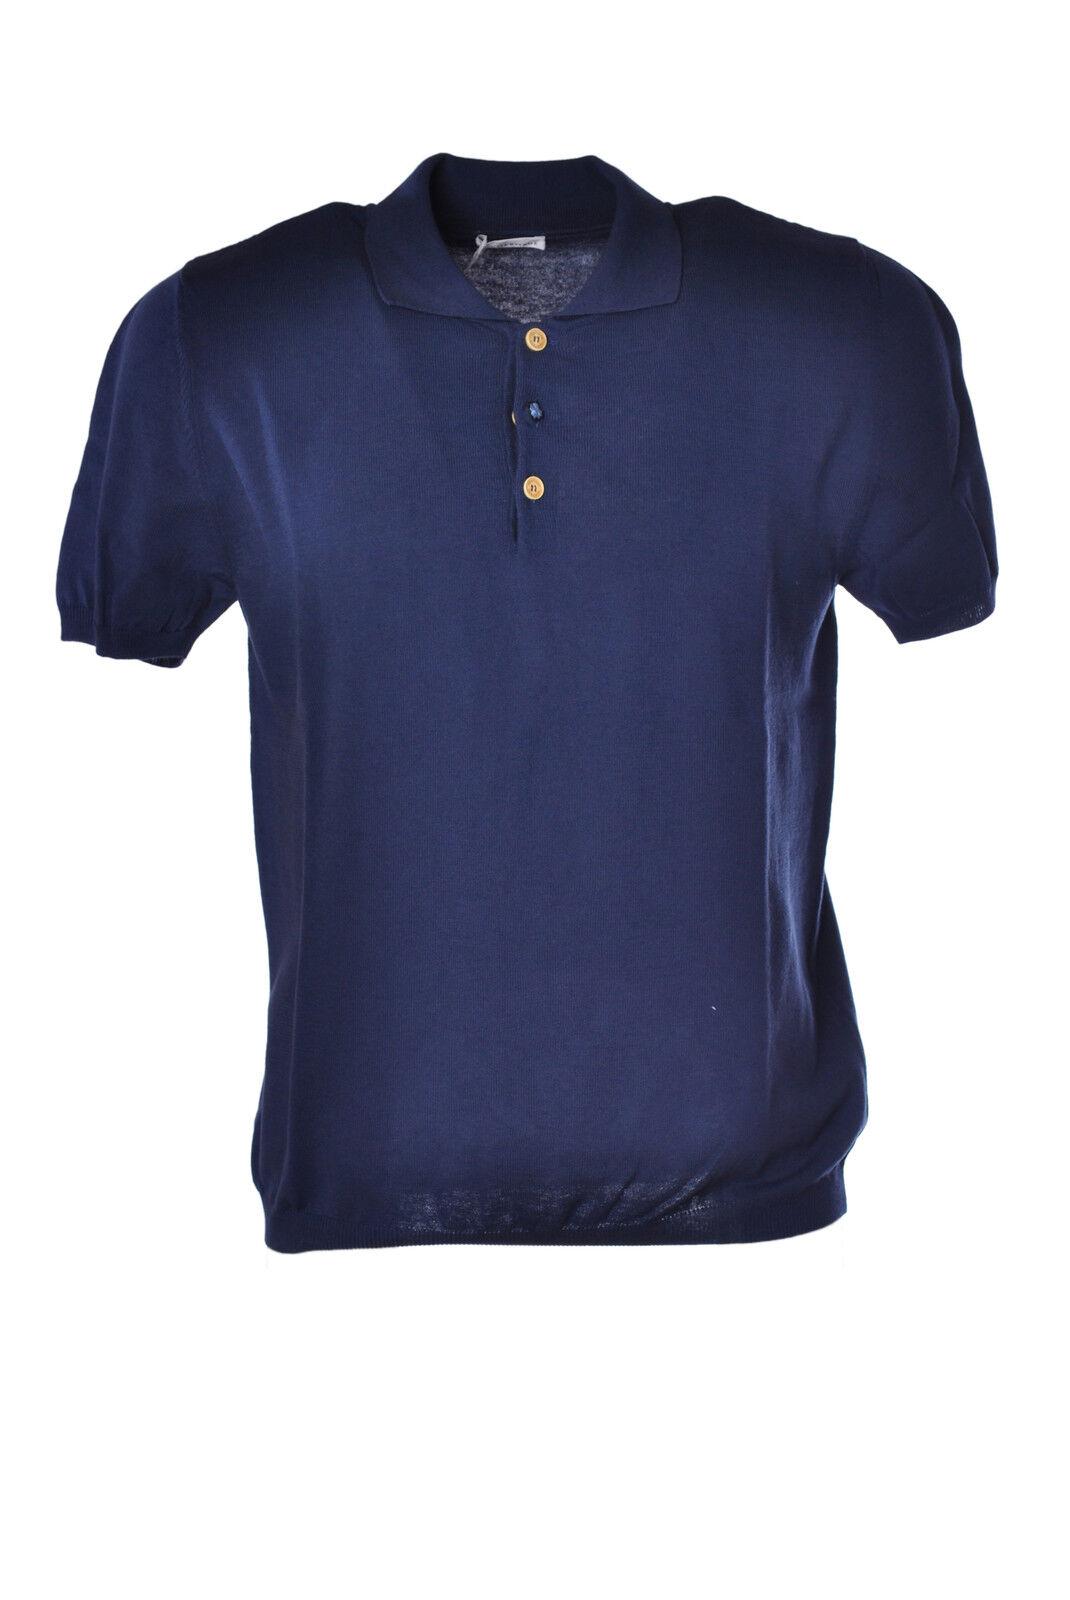 Heritage  -  Polo - Male - 52 - Blau - 1743318C162834